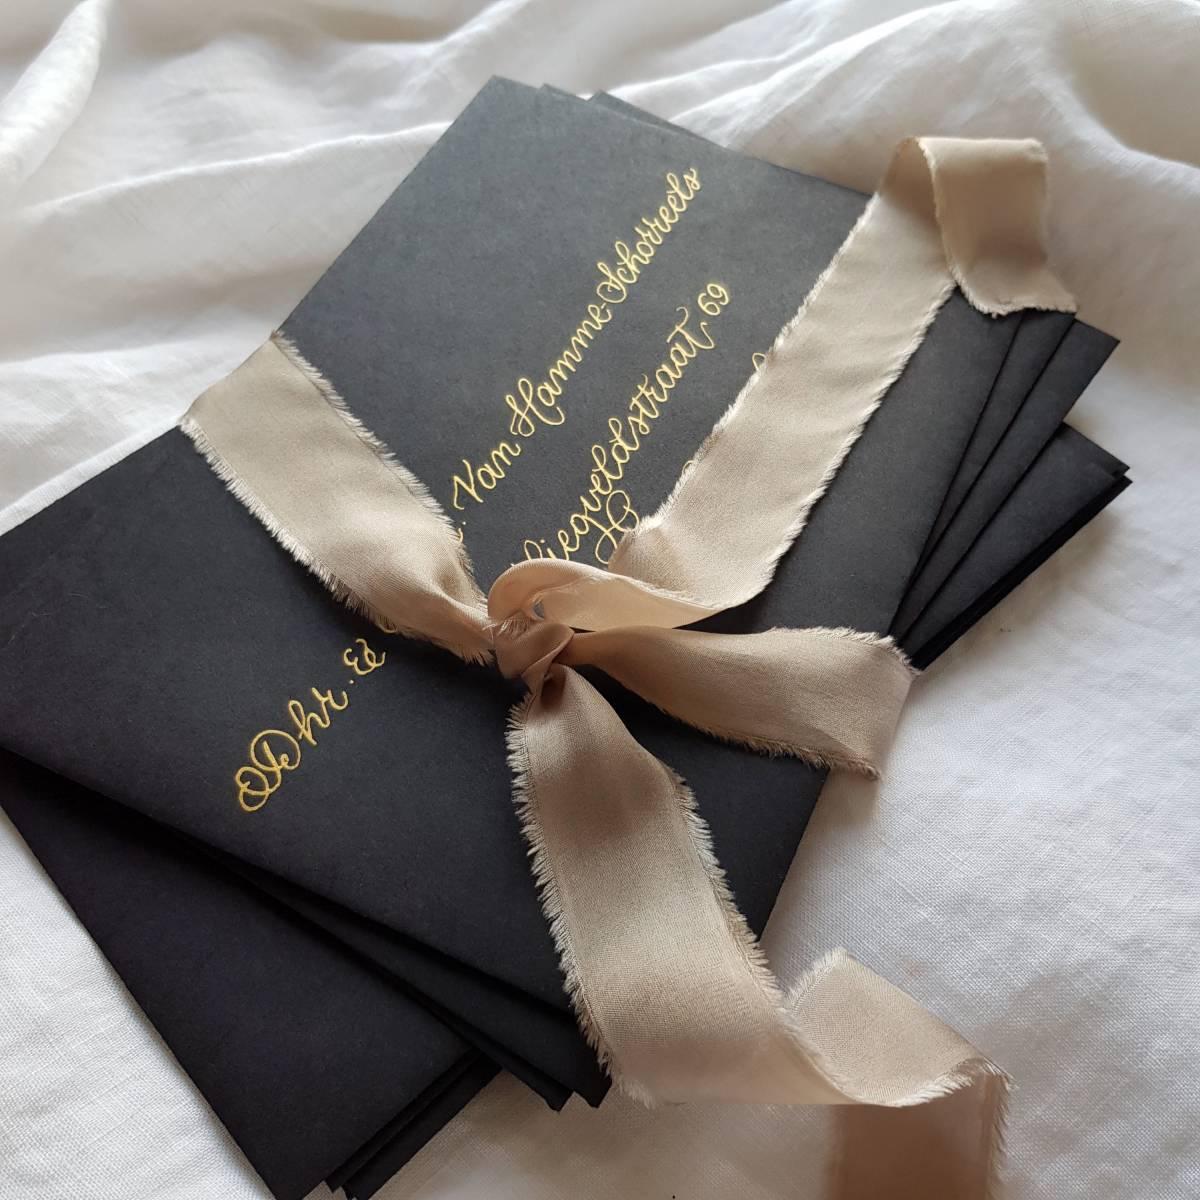 Touch of Gold - Trouwuitnodiging - Huwelijksuitnodiging - Kalligrafie - House of Weddings - 23 (1)